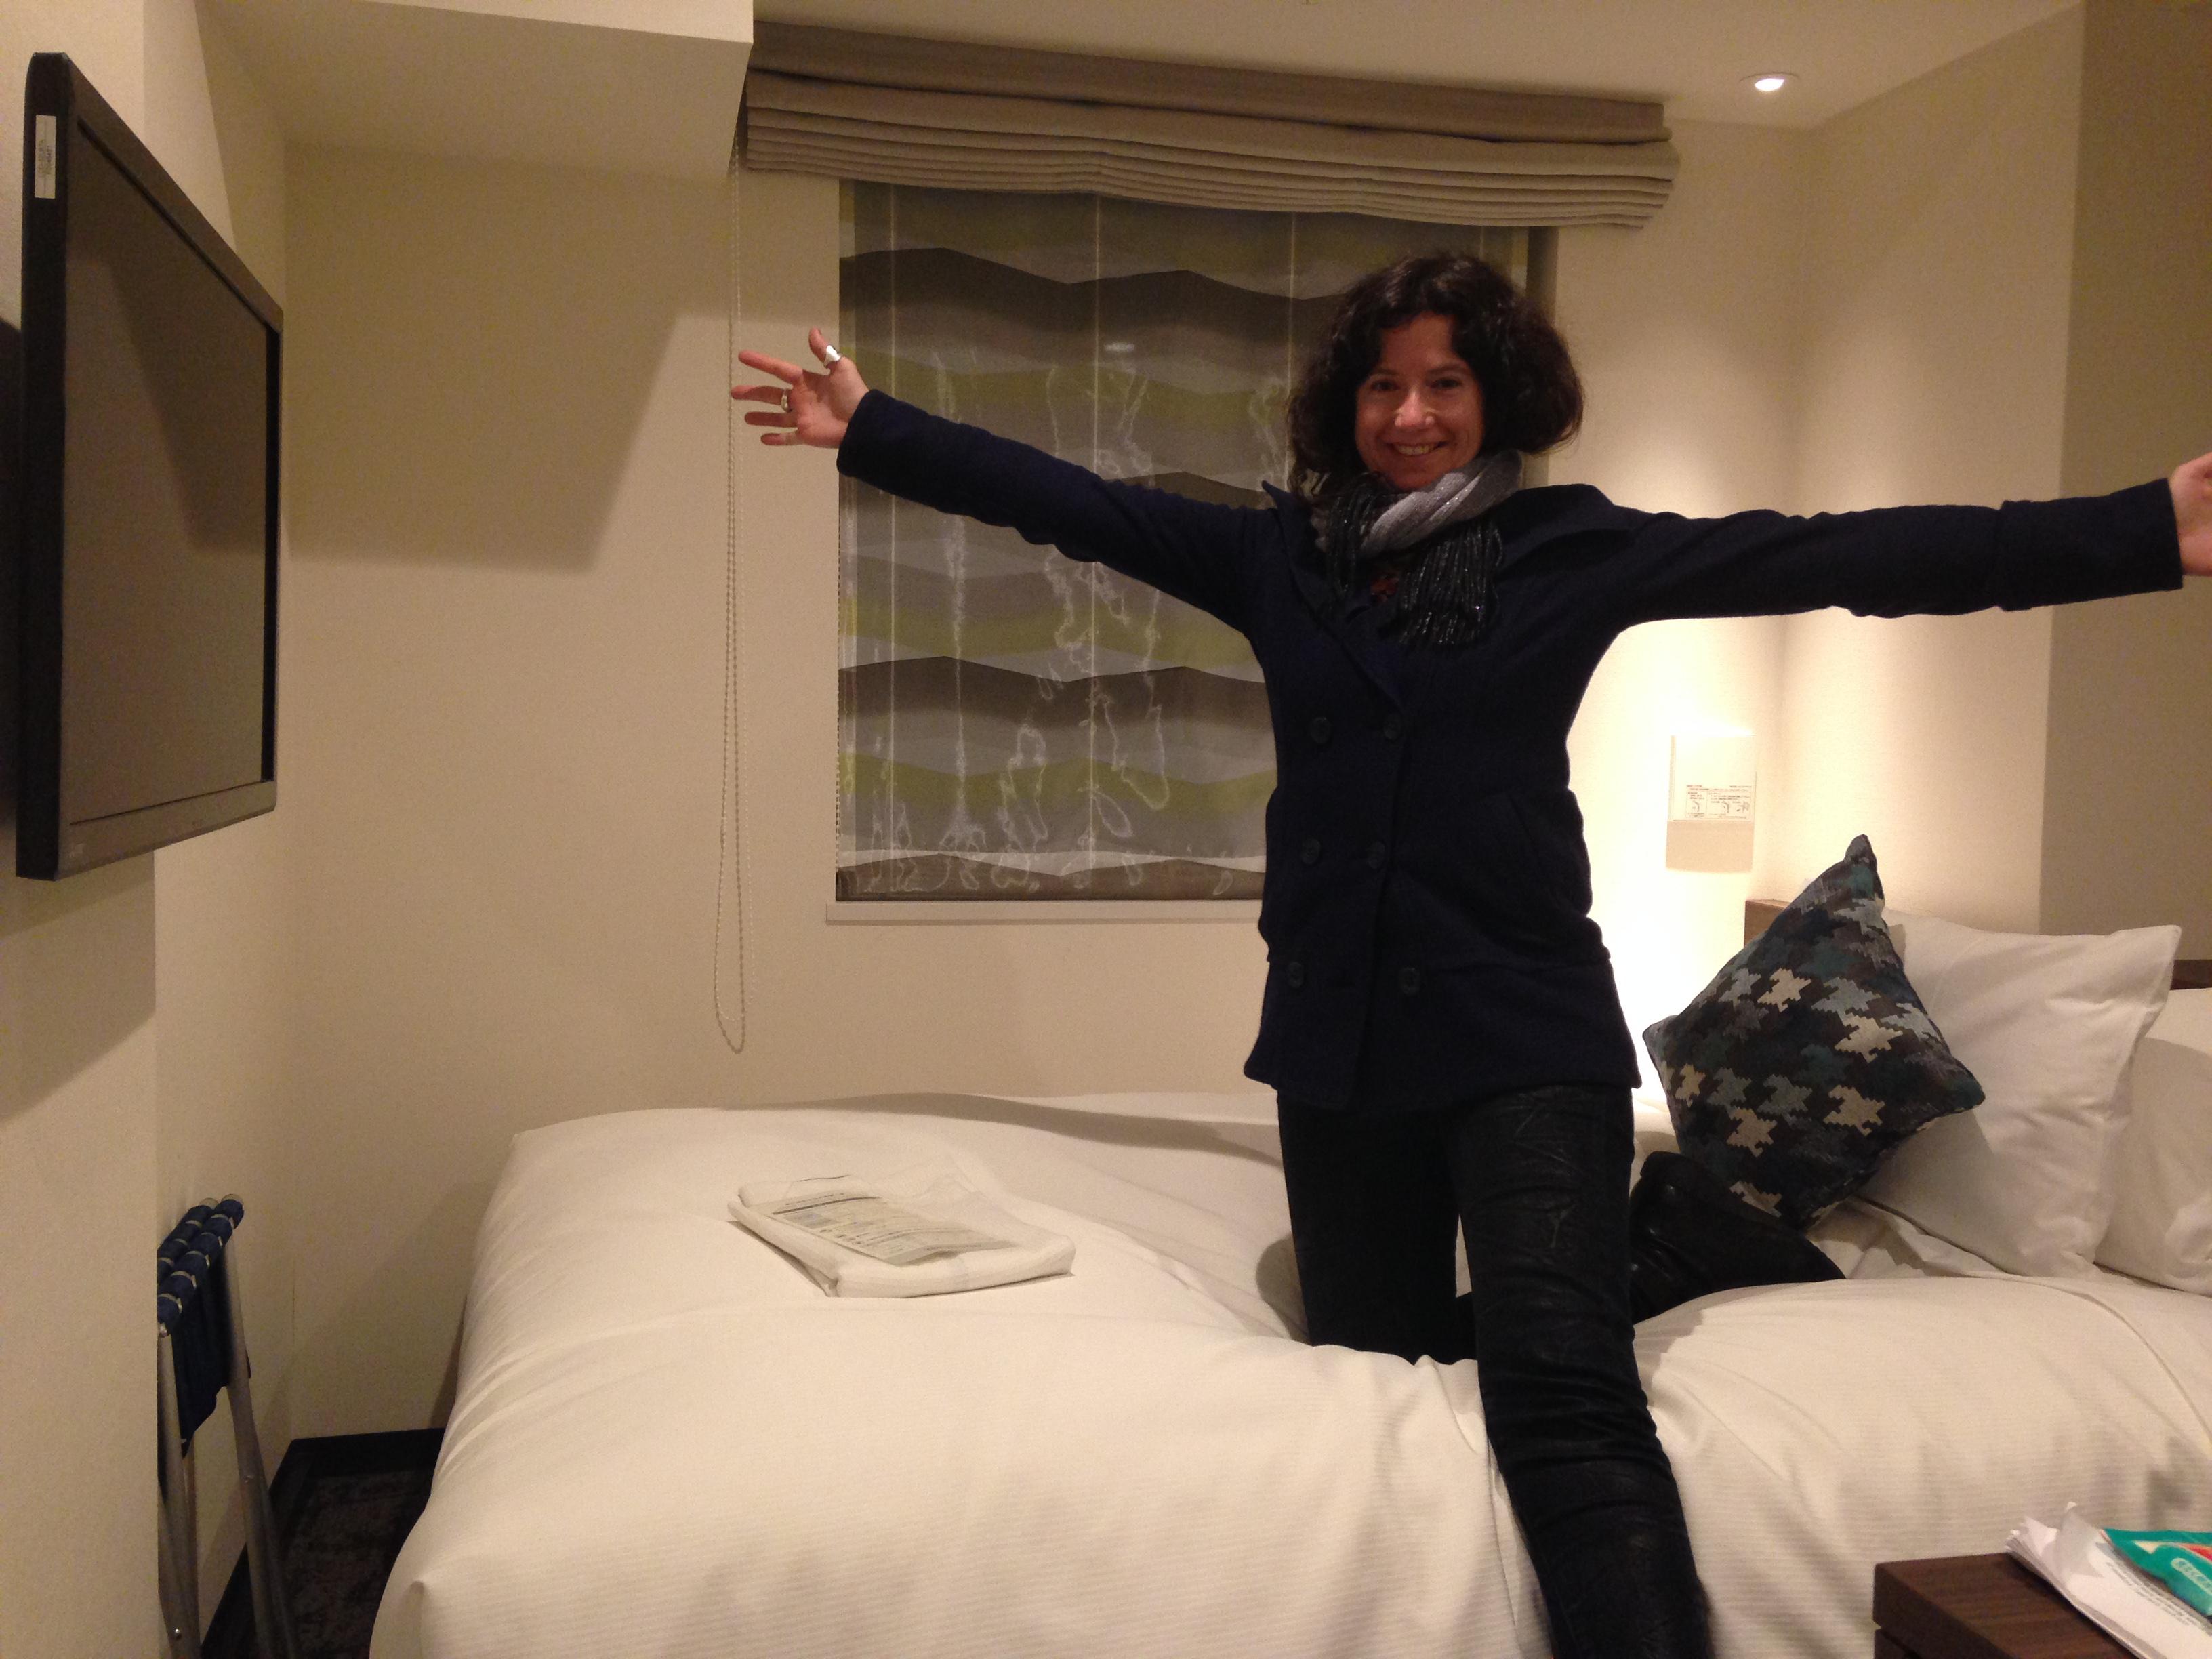 IMG: Liz Crain at the Tokyo Hotel